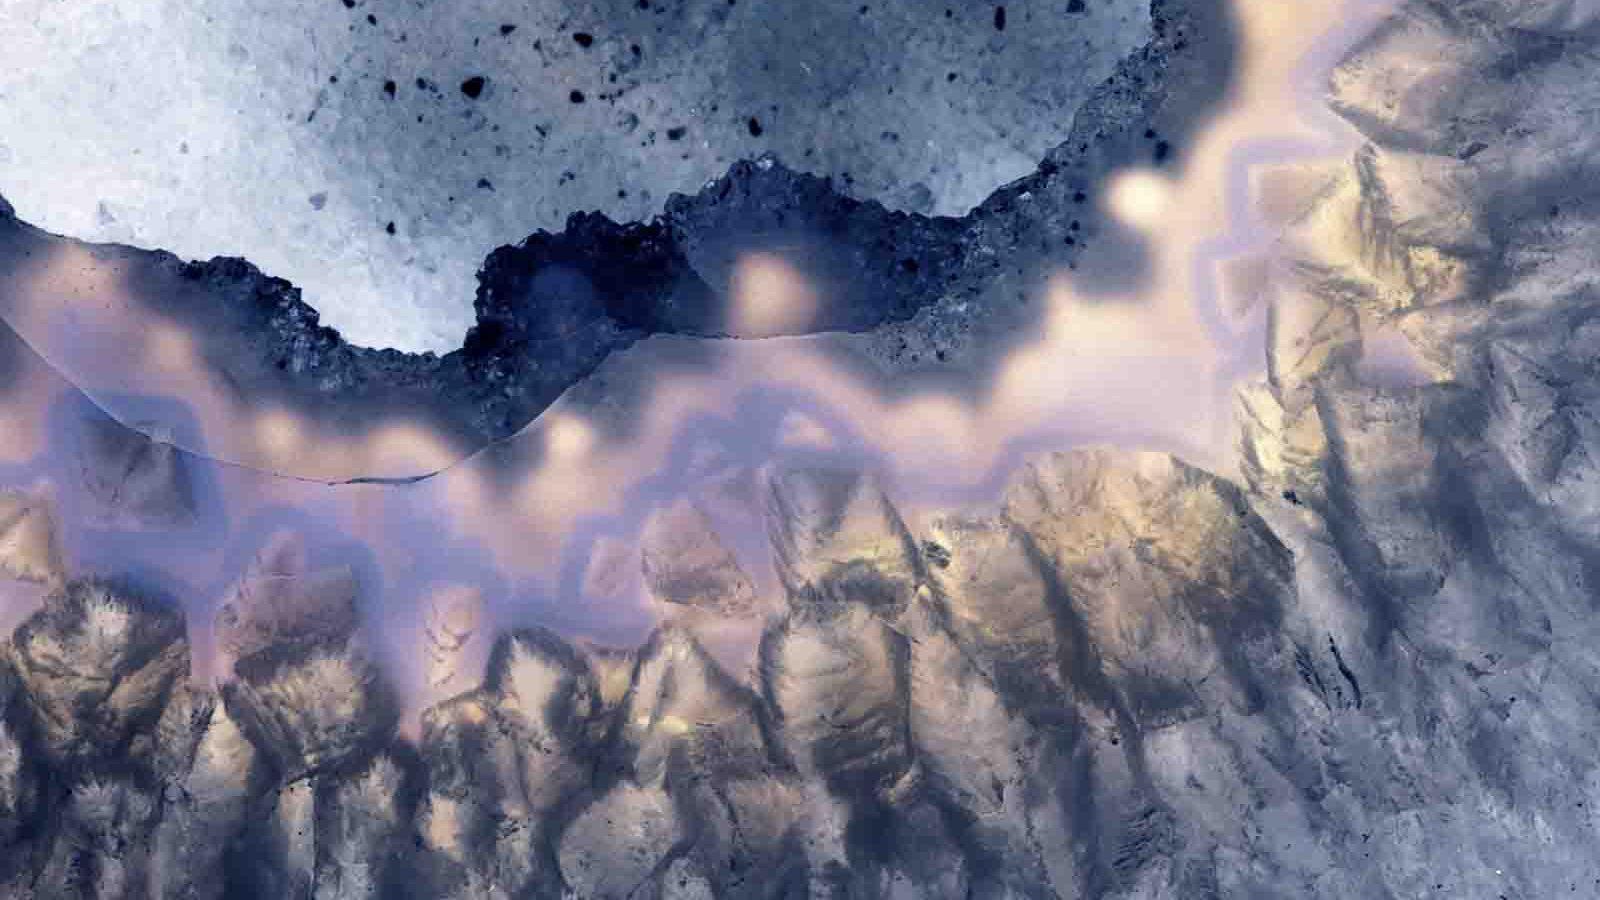 Closeup Macro Crystalline Crystal Patterns Textures In Geode Slices Of Rock